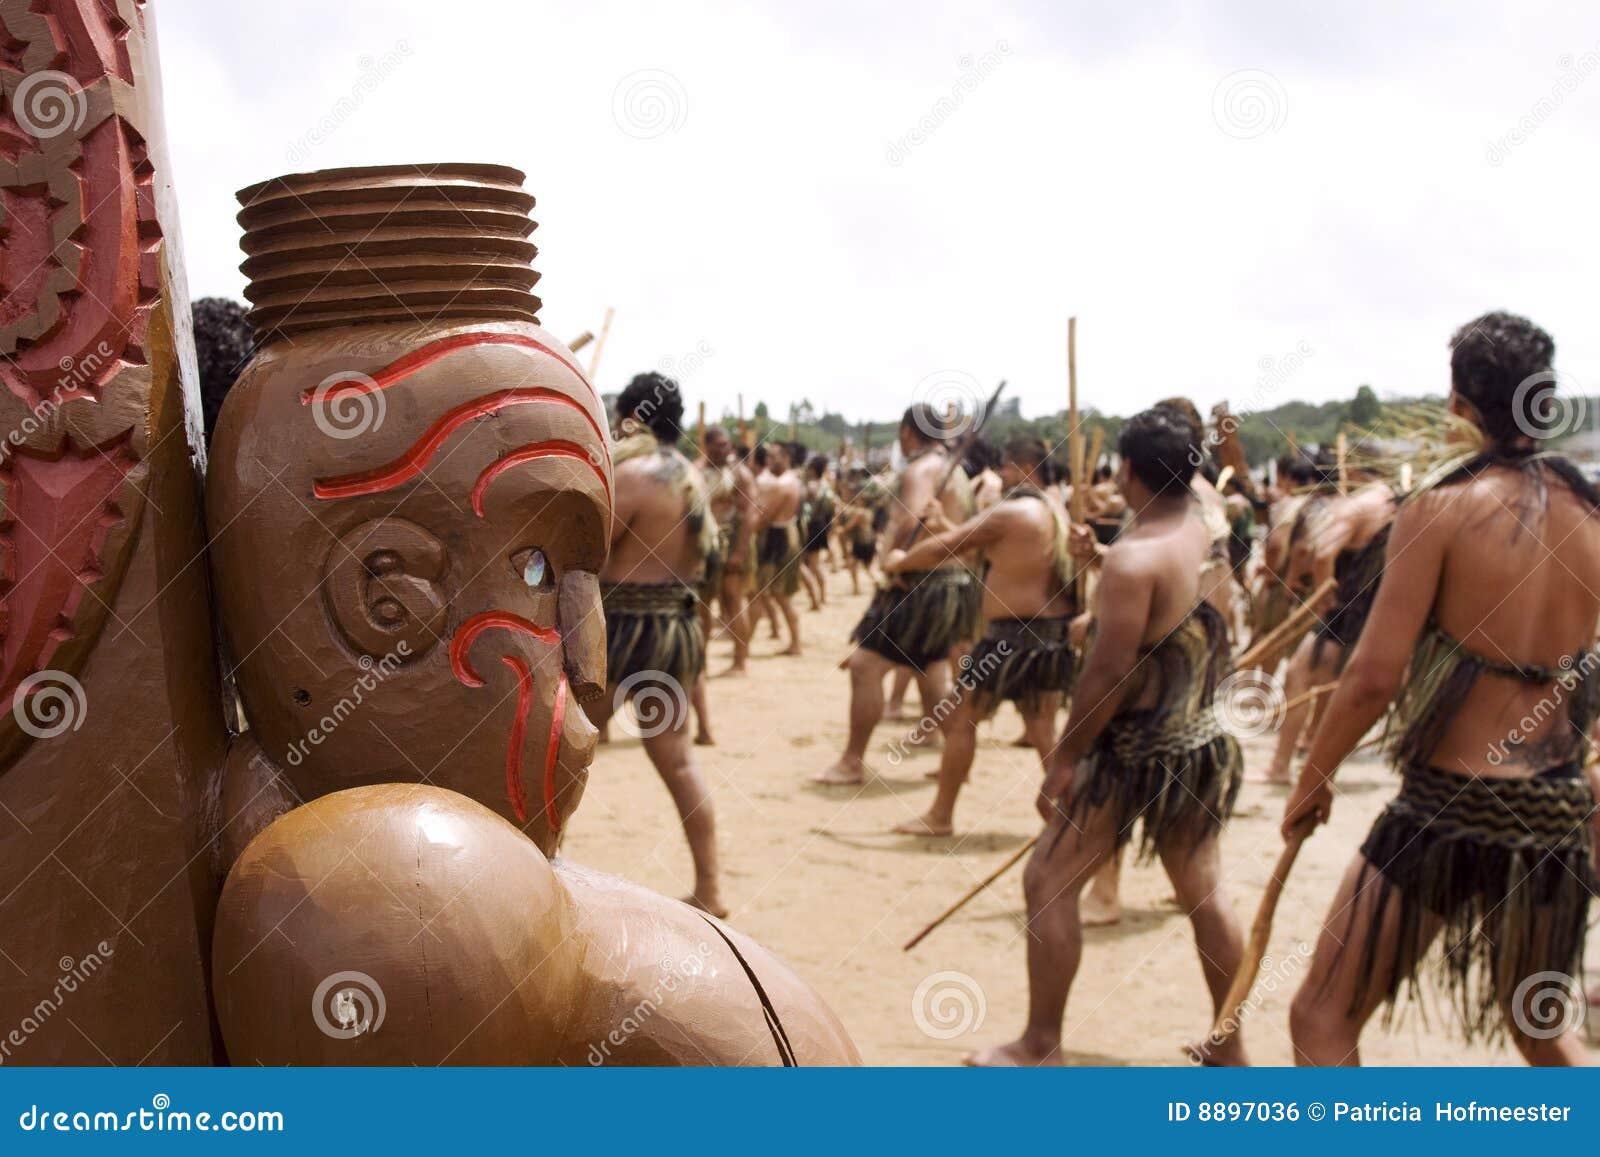 Danza maorí de Haka (guerra) en Waitingi en Nueva Zelandia